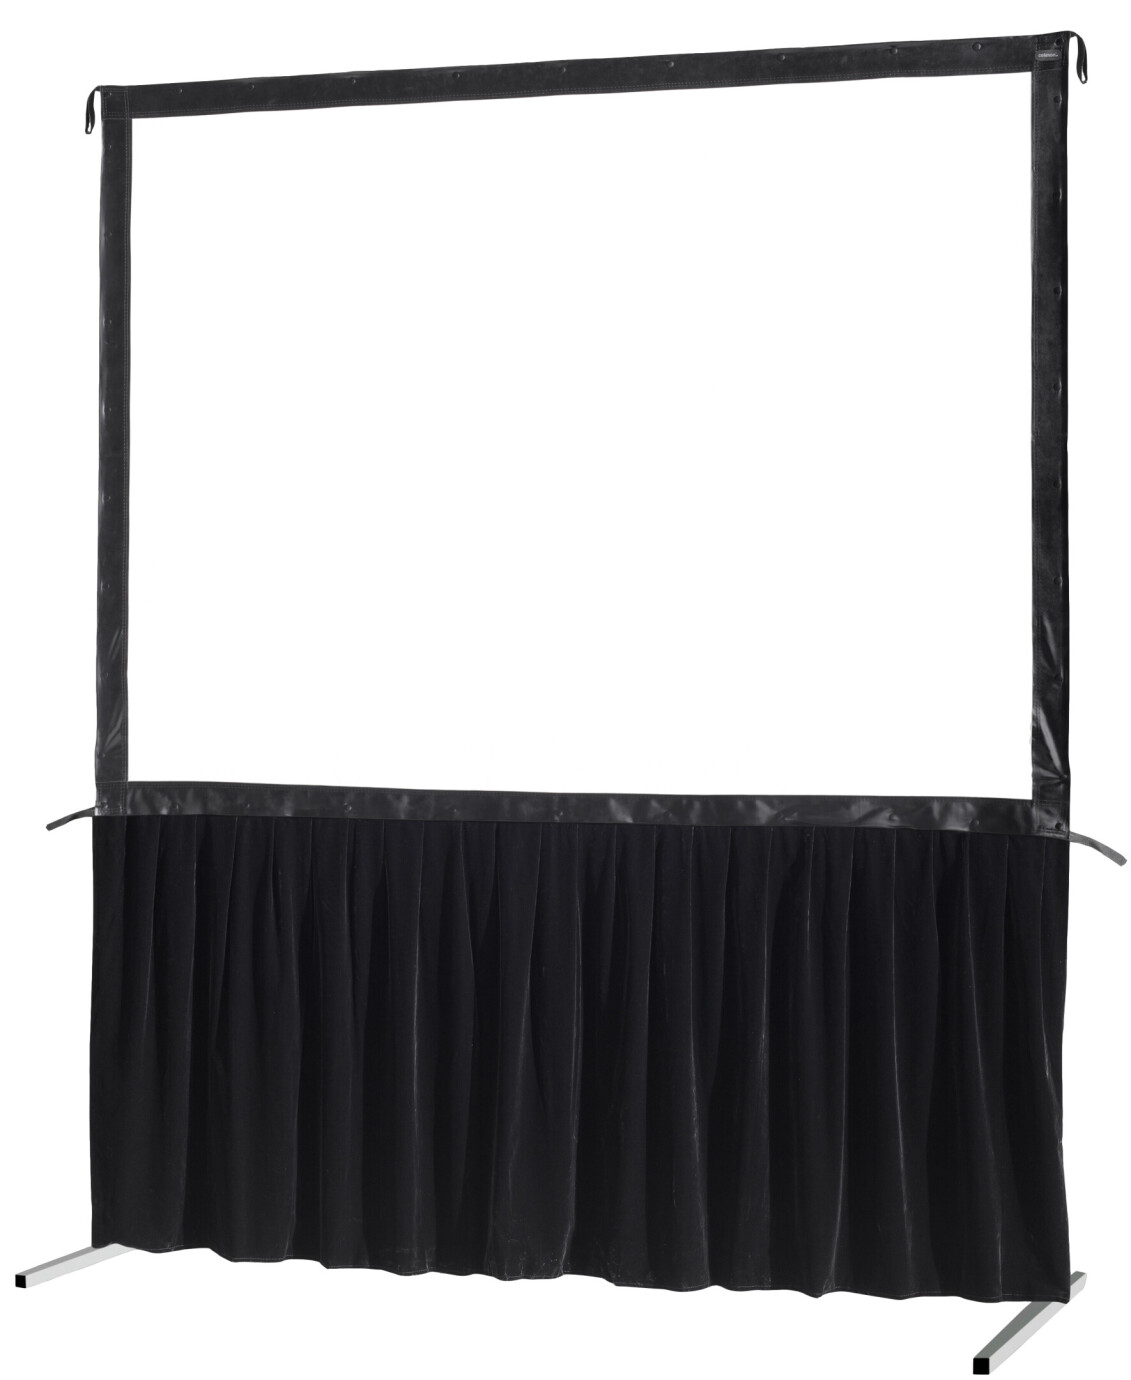 celexon Vorhangset 1-seitig für Faltrahmenleinwand Mobil Expert 366 x 274 cm